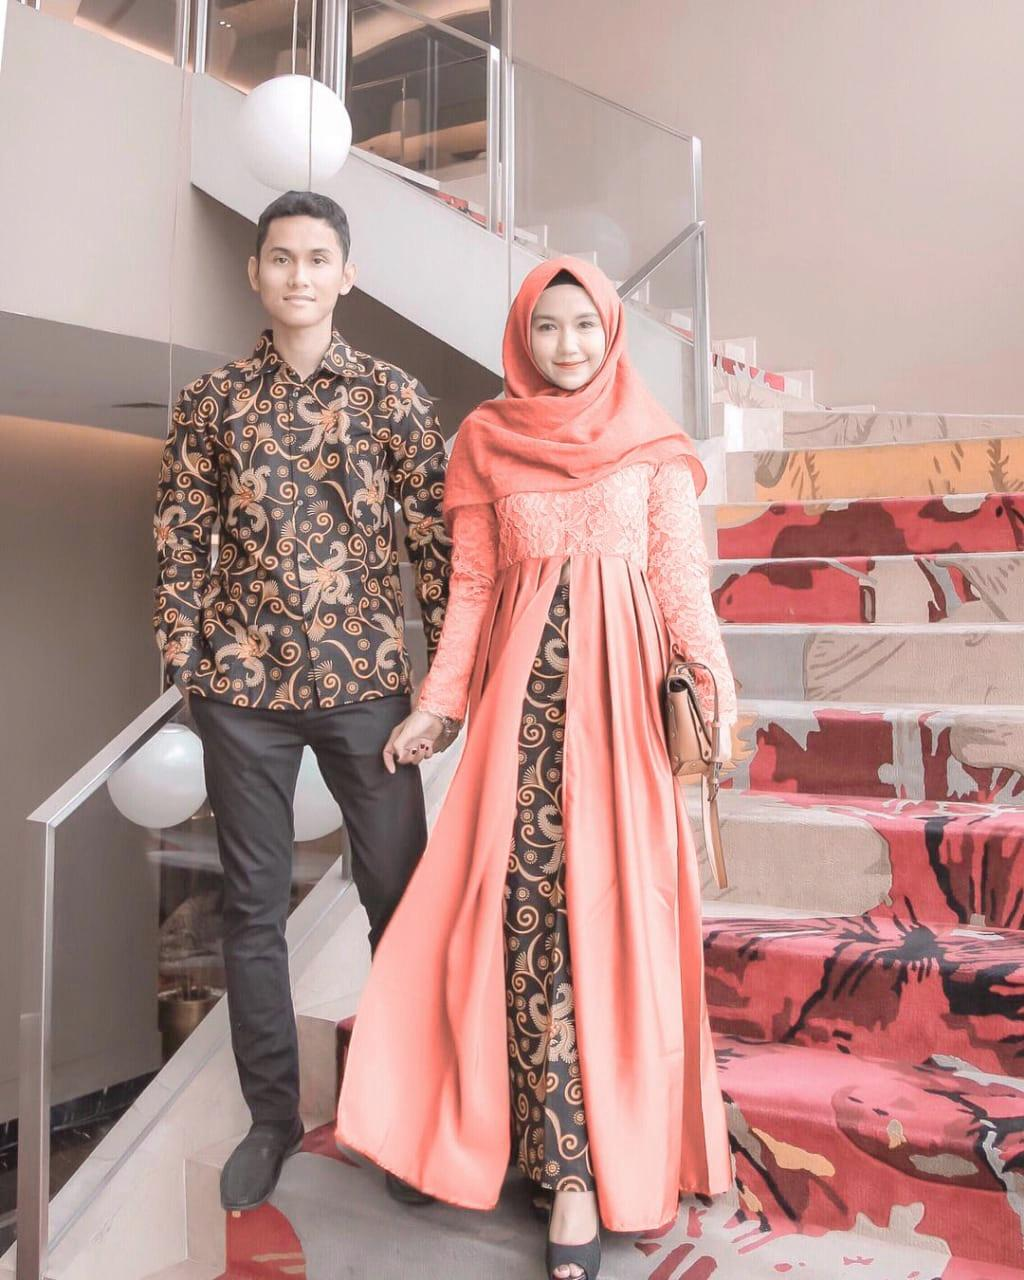 TERMURAH - Batik Couple   Couple Batik   Baju Muslim Wanita Terbaru 2018   Batik  Murah e22f585c4d